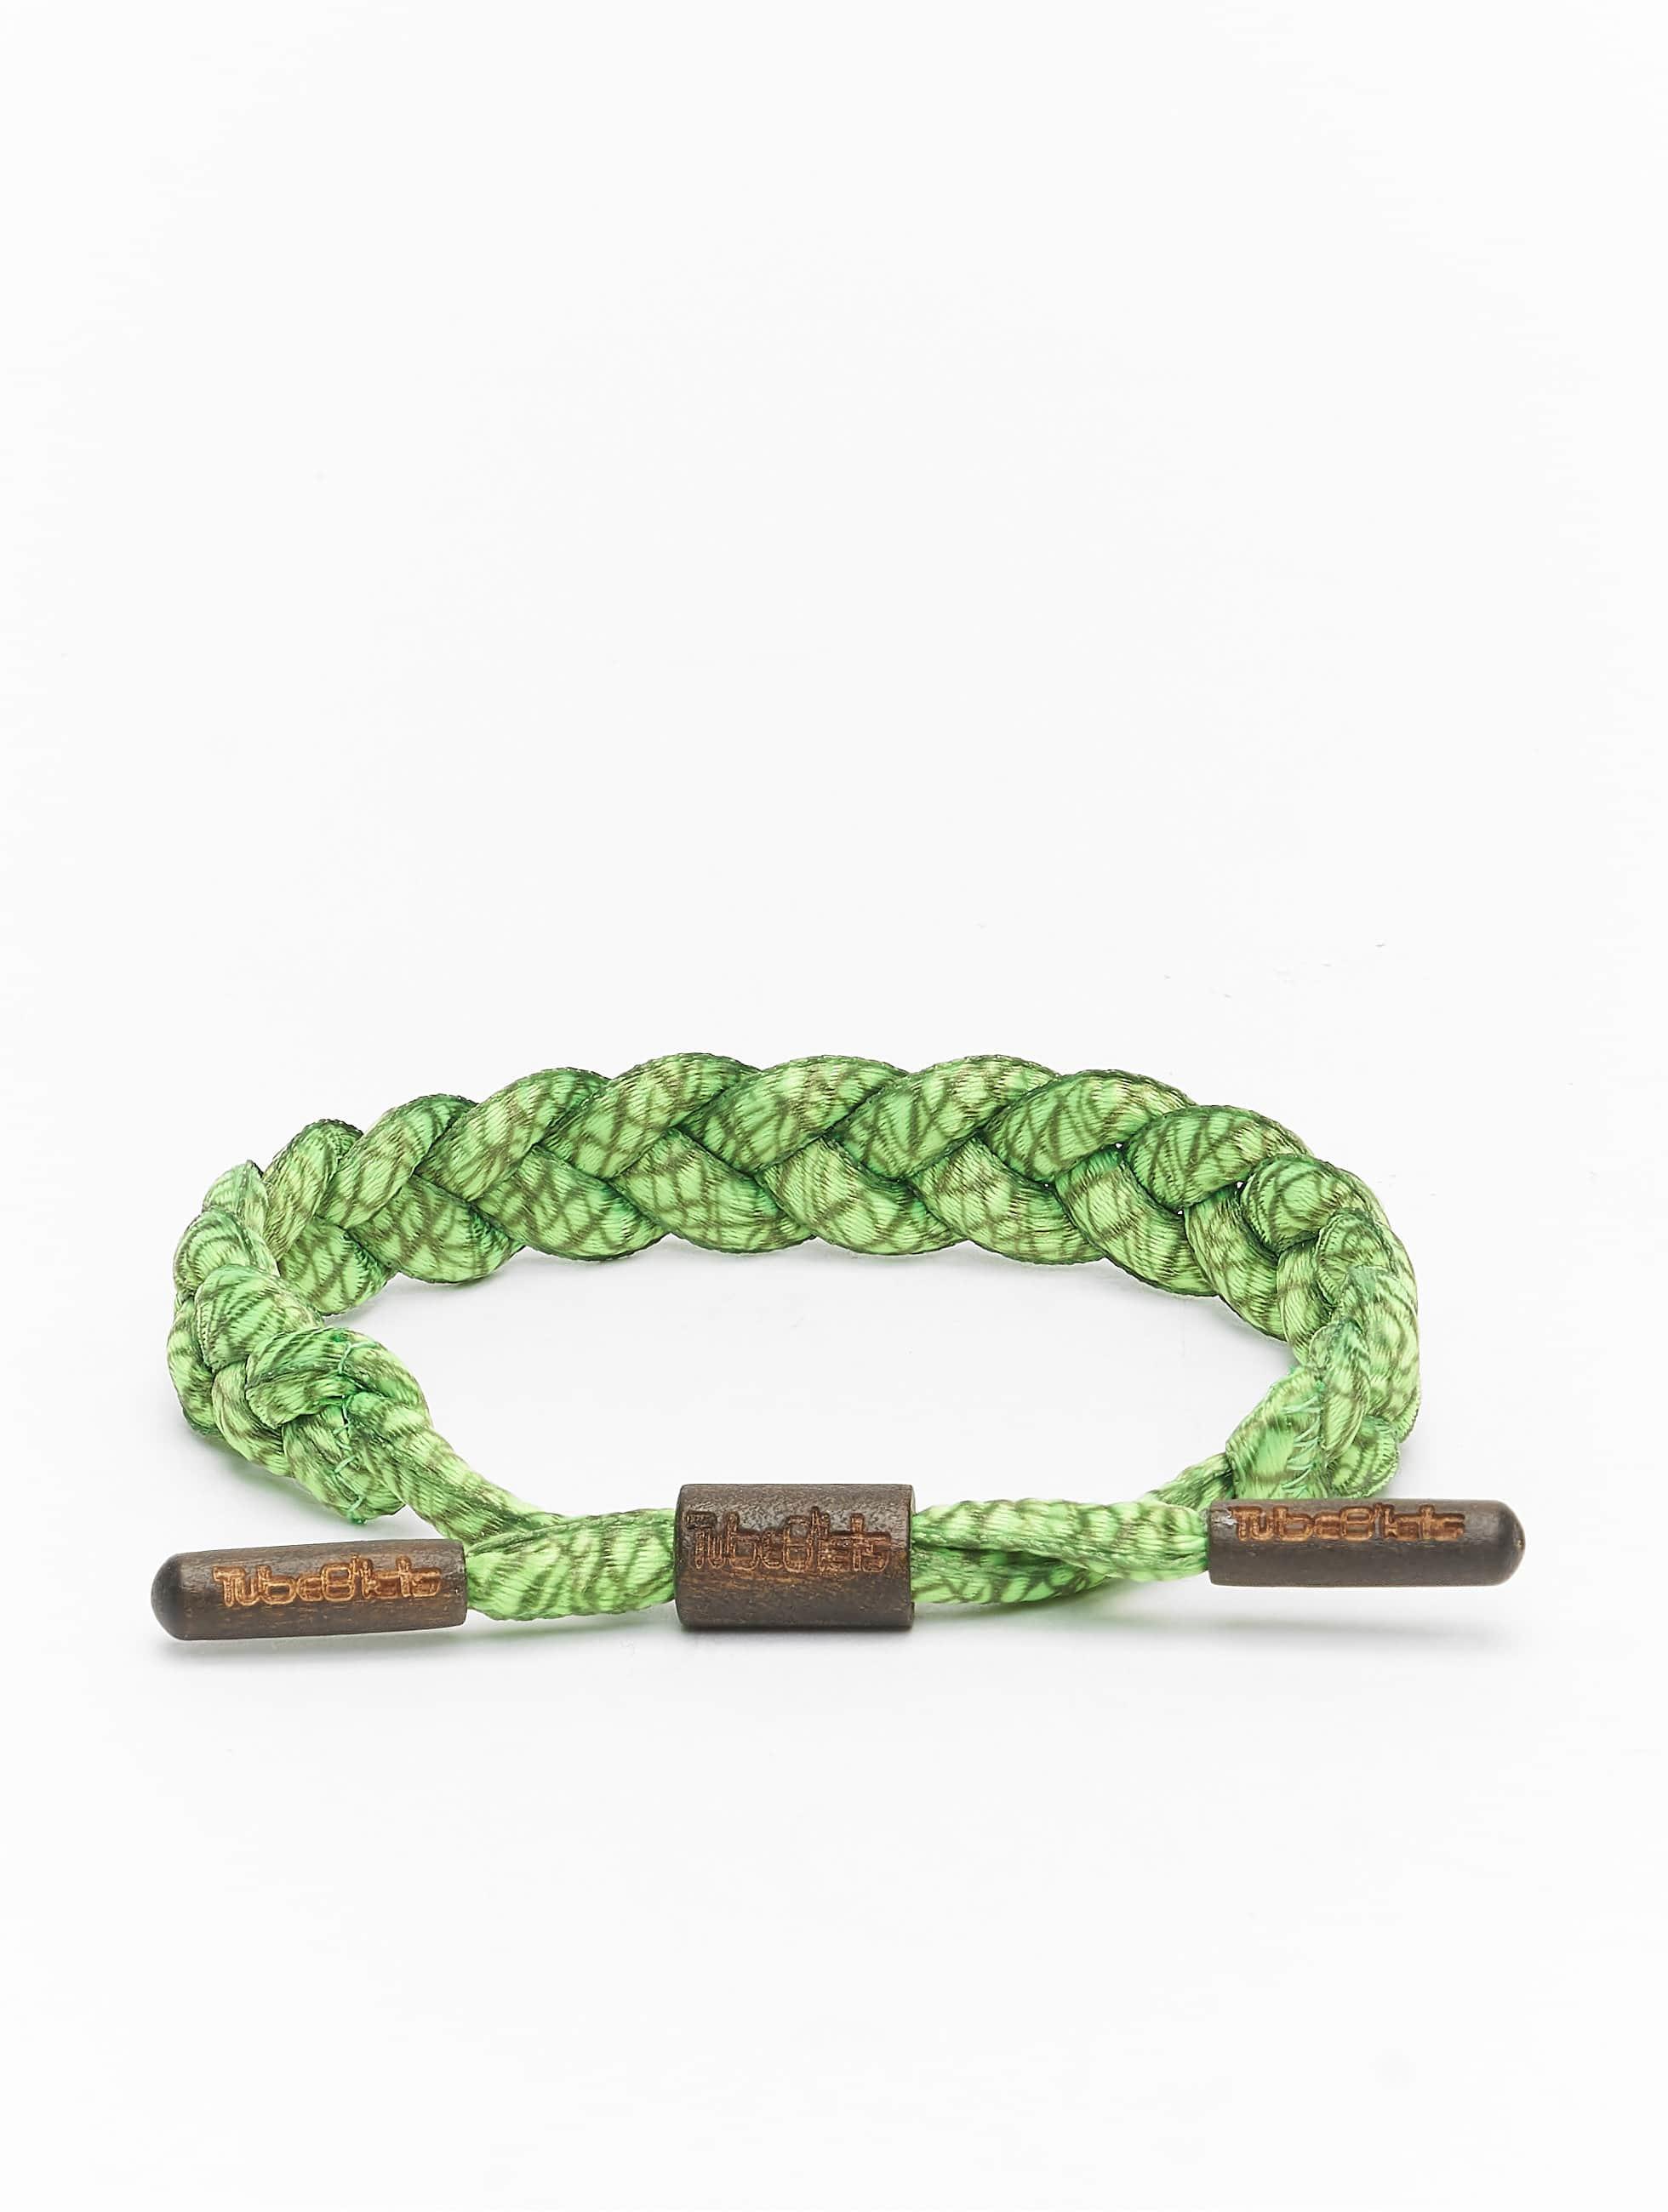 Tubelaces armband TubeBlet groen